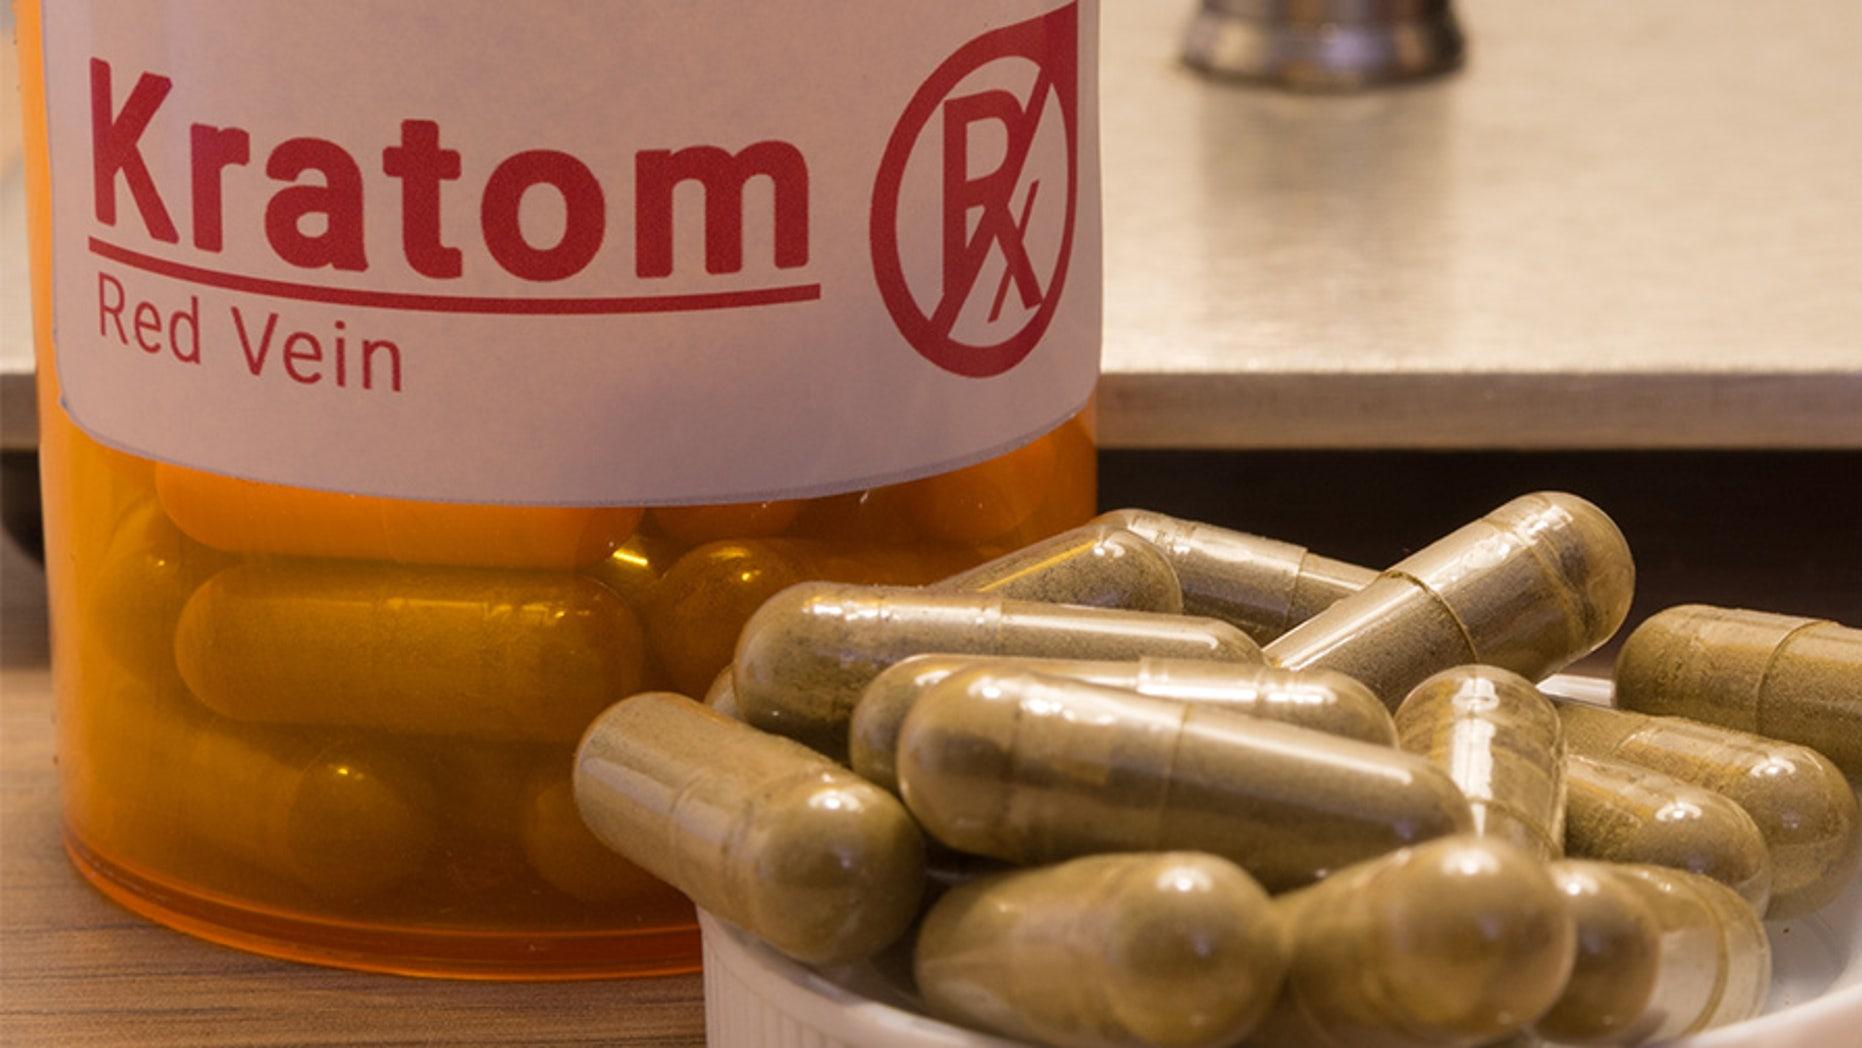 Image of actual kratom pills with a faux prescription logo.